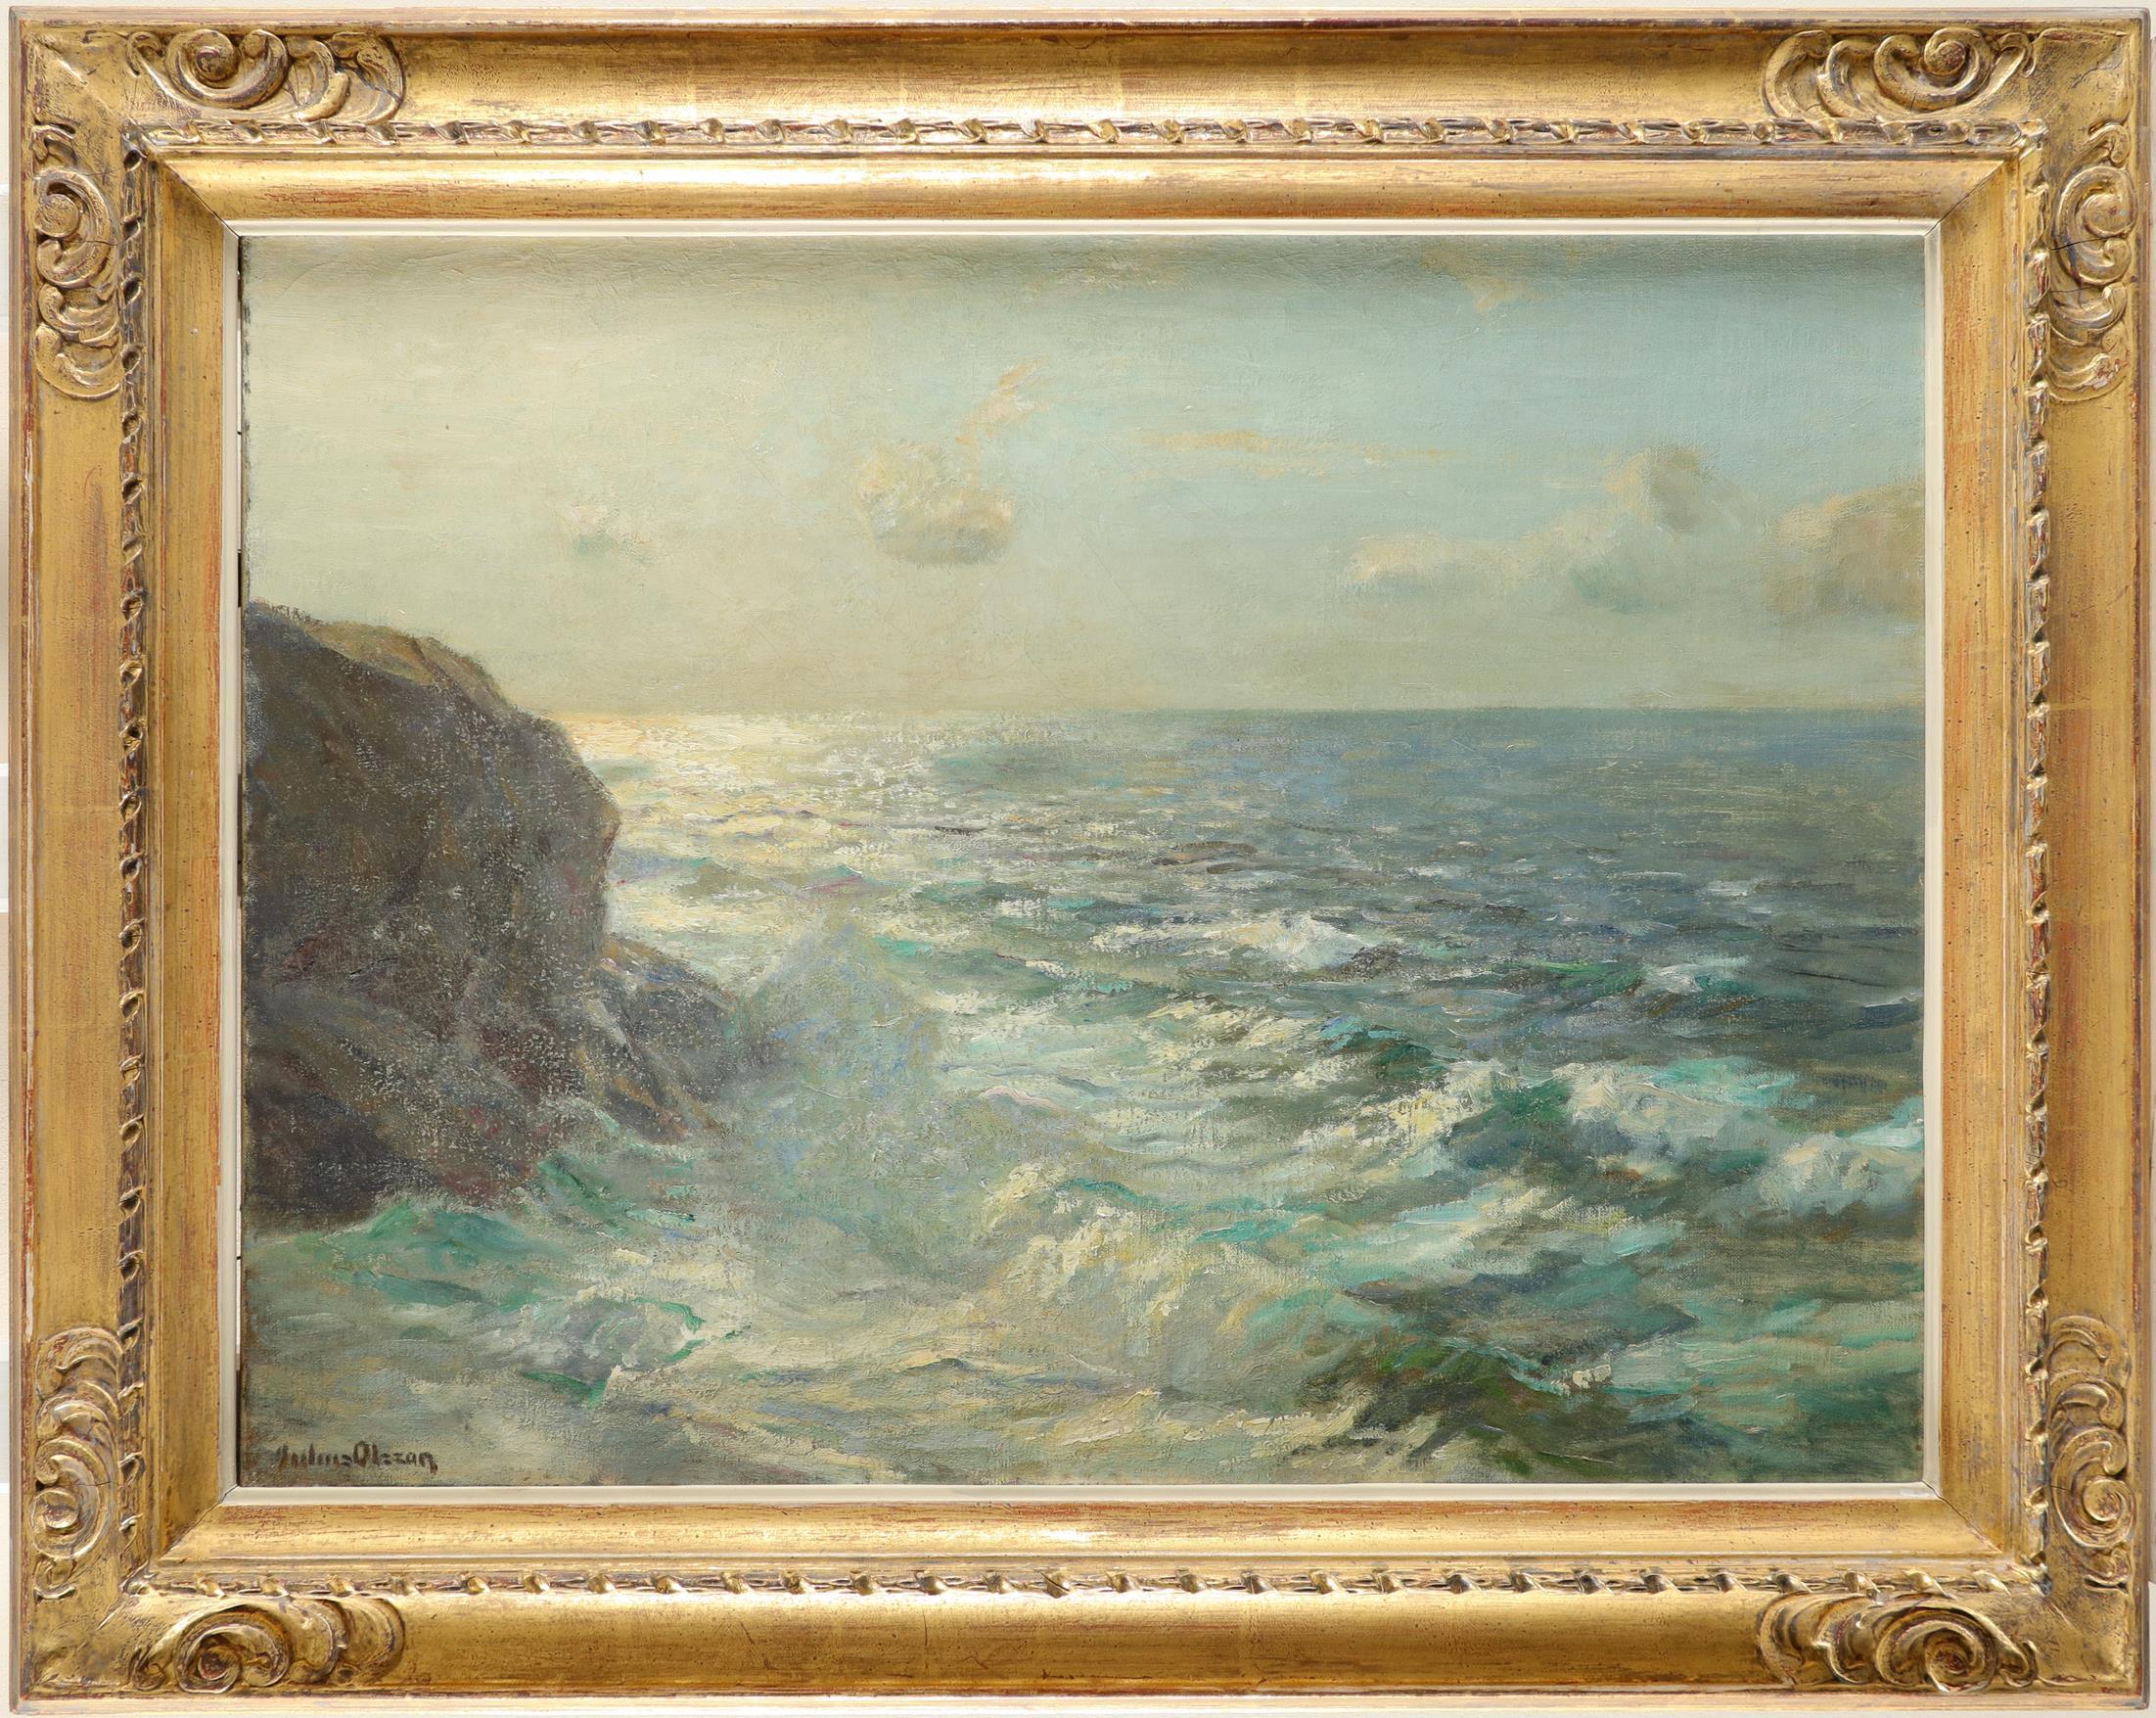 Julius Olsson RA (1864-1942) Dawn light over a calm sea Signed Julius Olsson (lower left) Oil on - Image 2 of 3